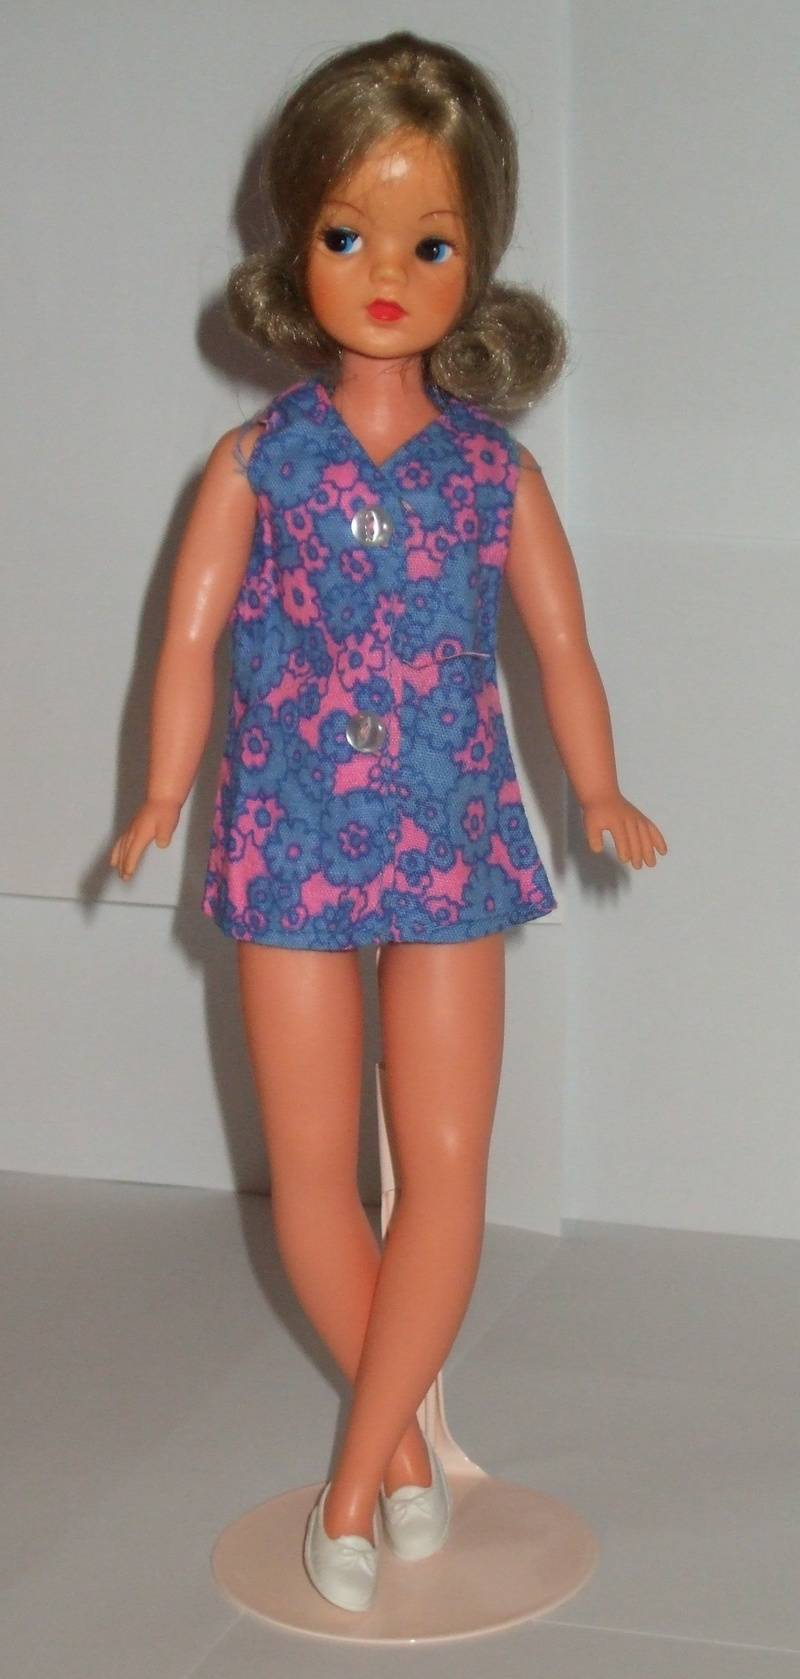 Fun Fashion - Sleeveless dress 1973 version